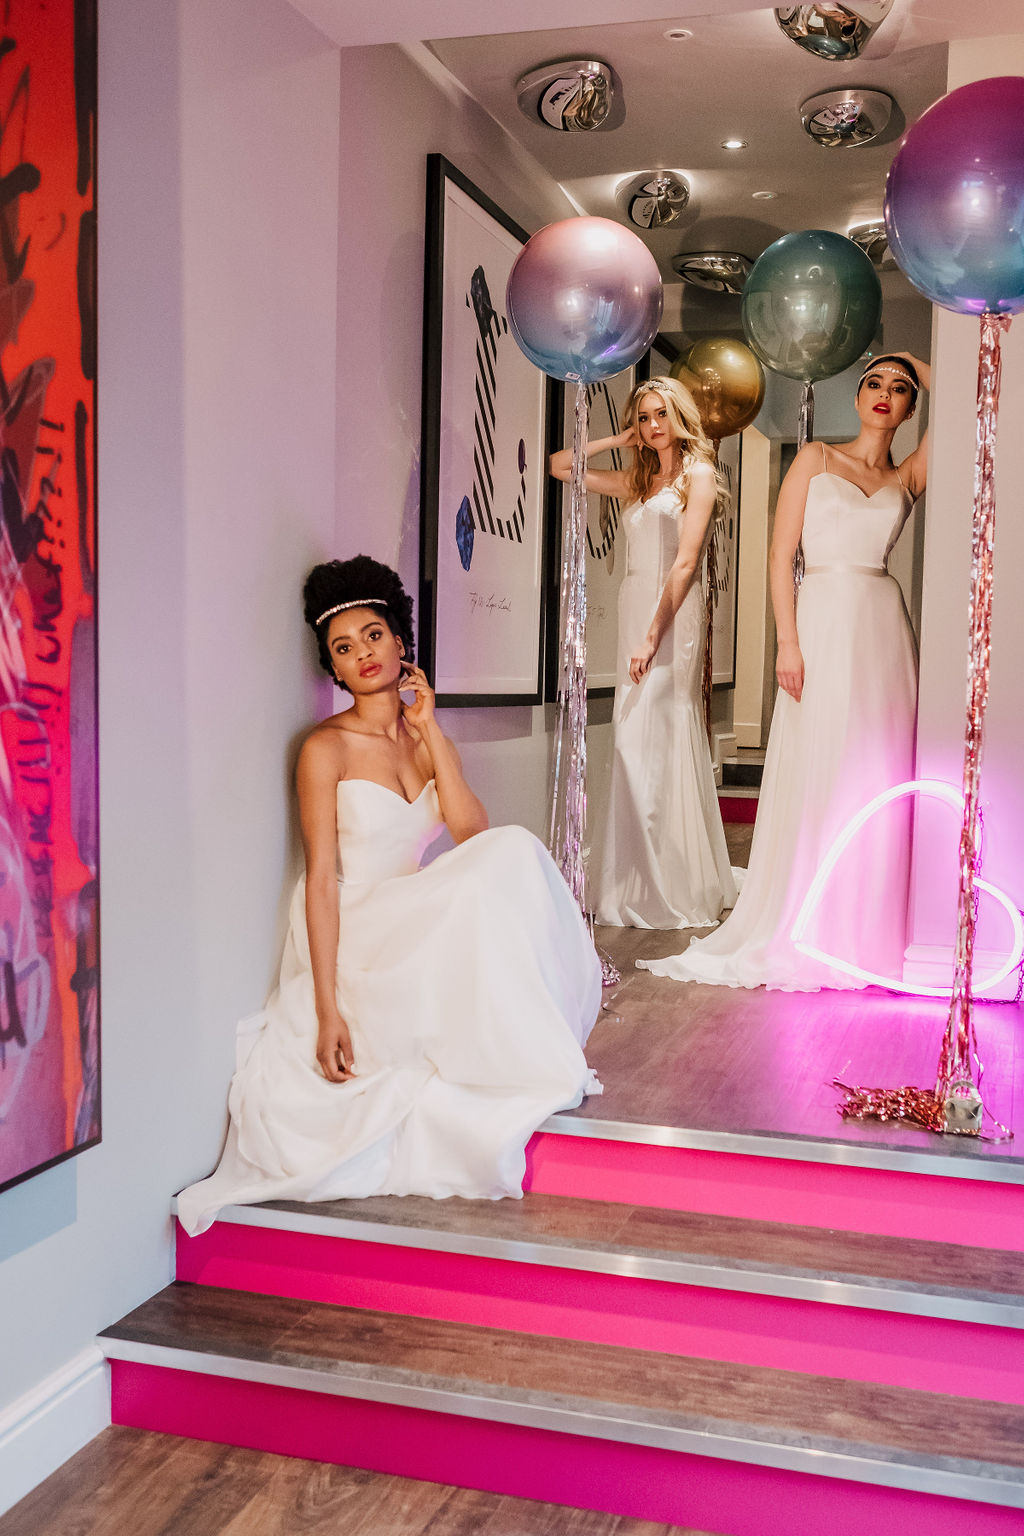 SarahGlynnPhotography-10.1.2019-Bridesupnorth-CharltonHall-191.jpg